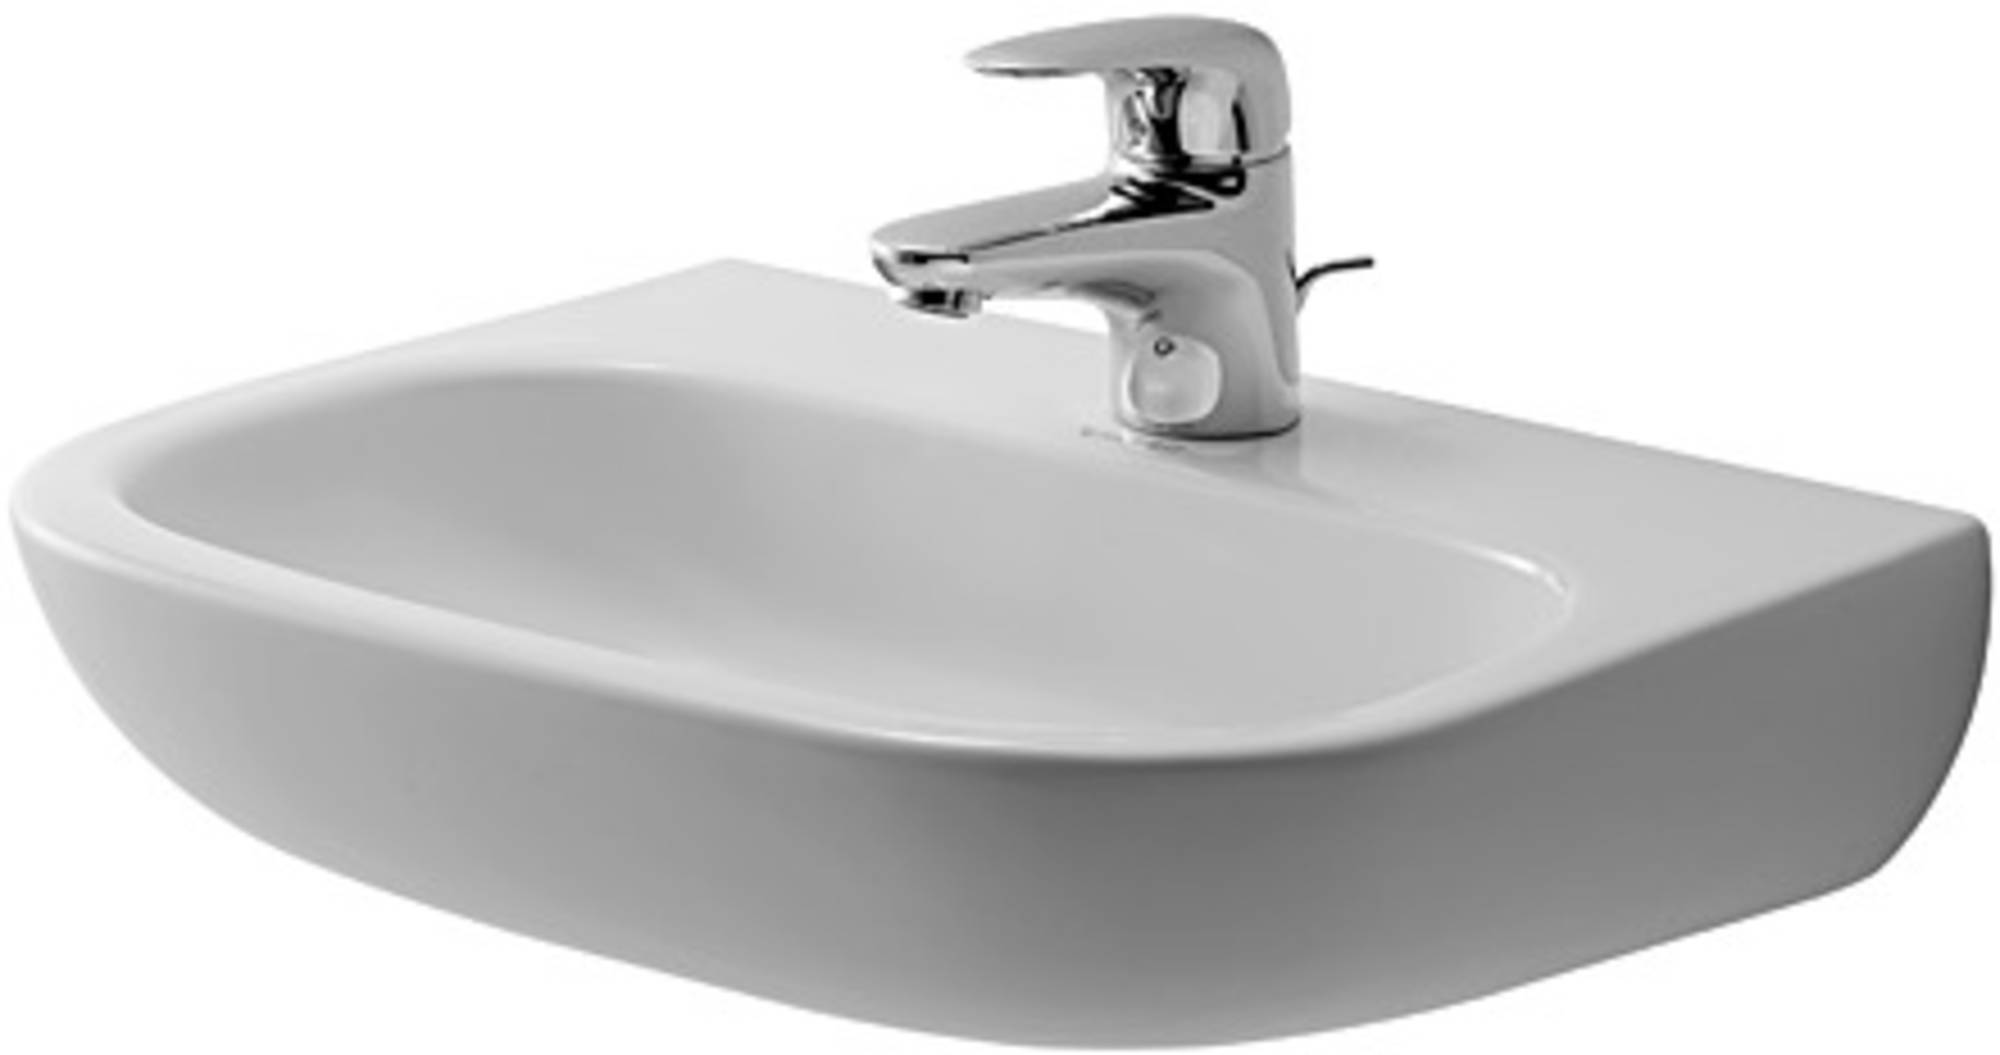 Praxis Toilet Fontein : ▷ toilet fontein praxis kopen online internetwinkel